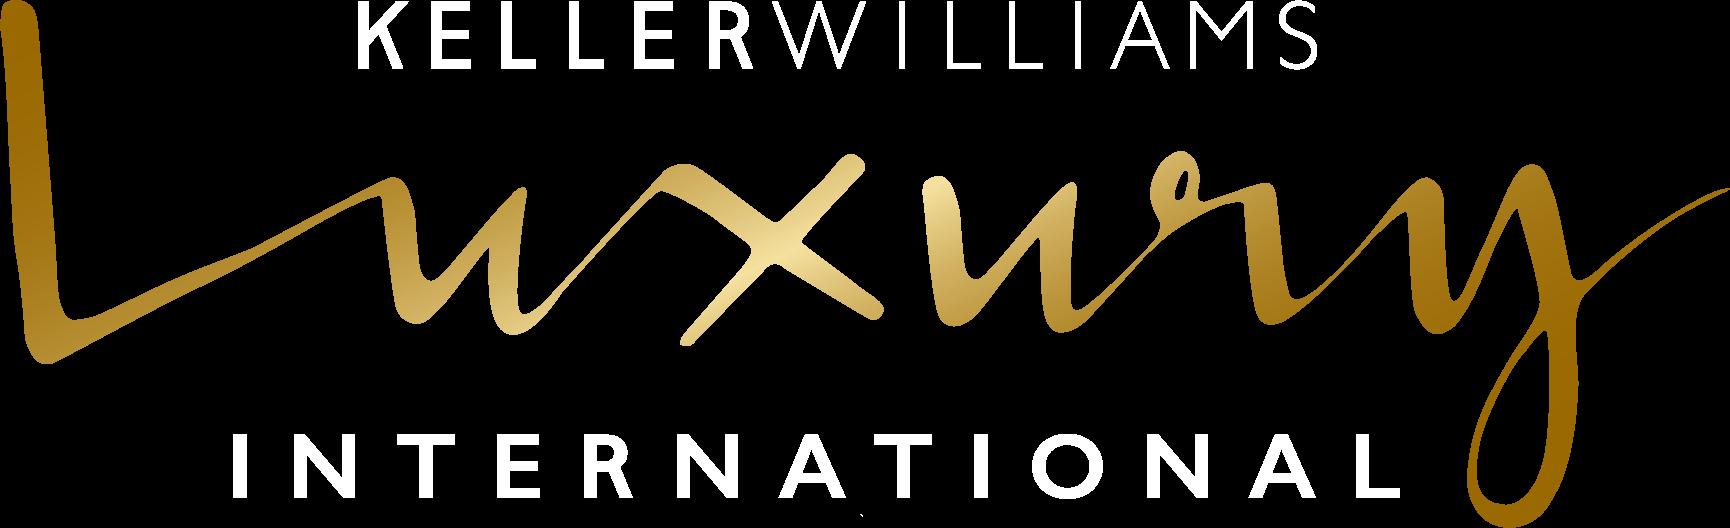 KW_LuxuryInternational_Logo_RGB_W-Gold.png